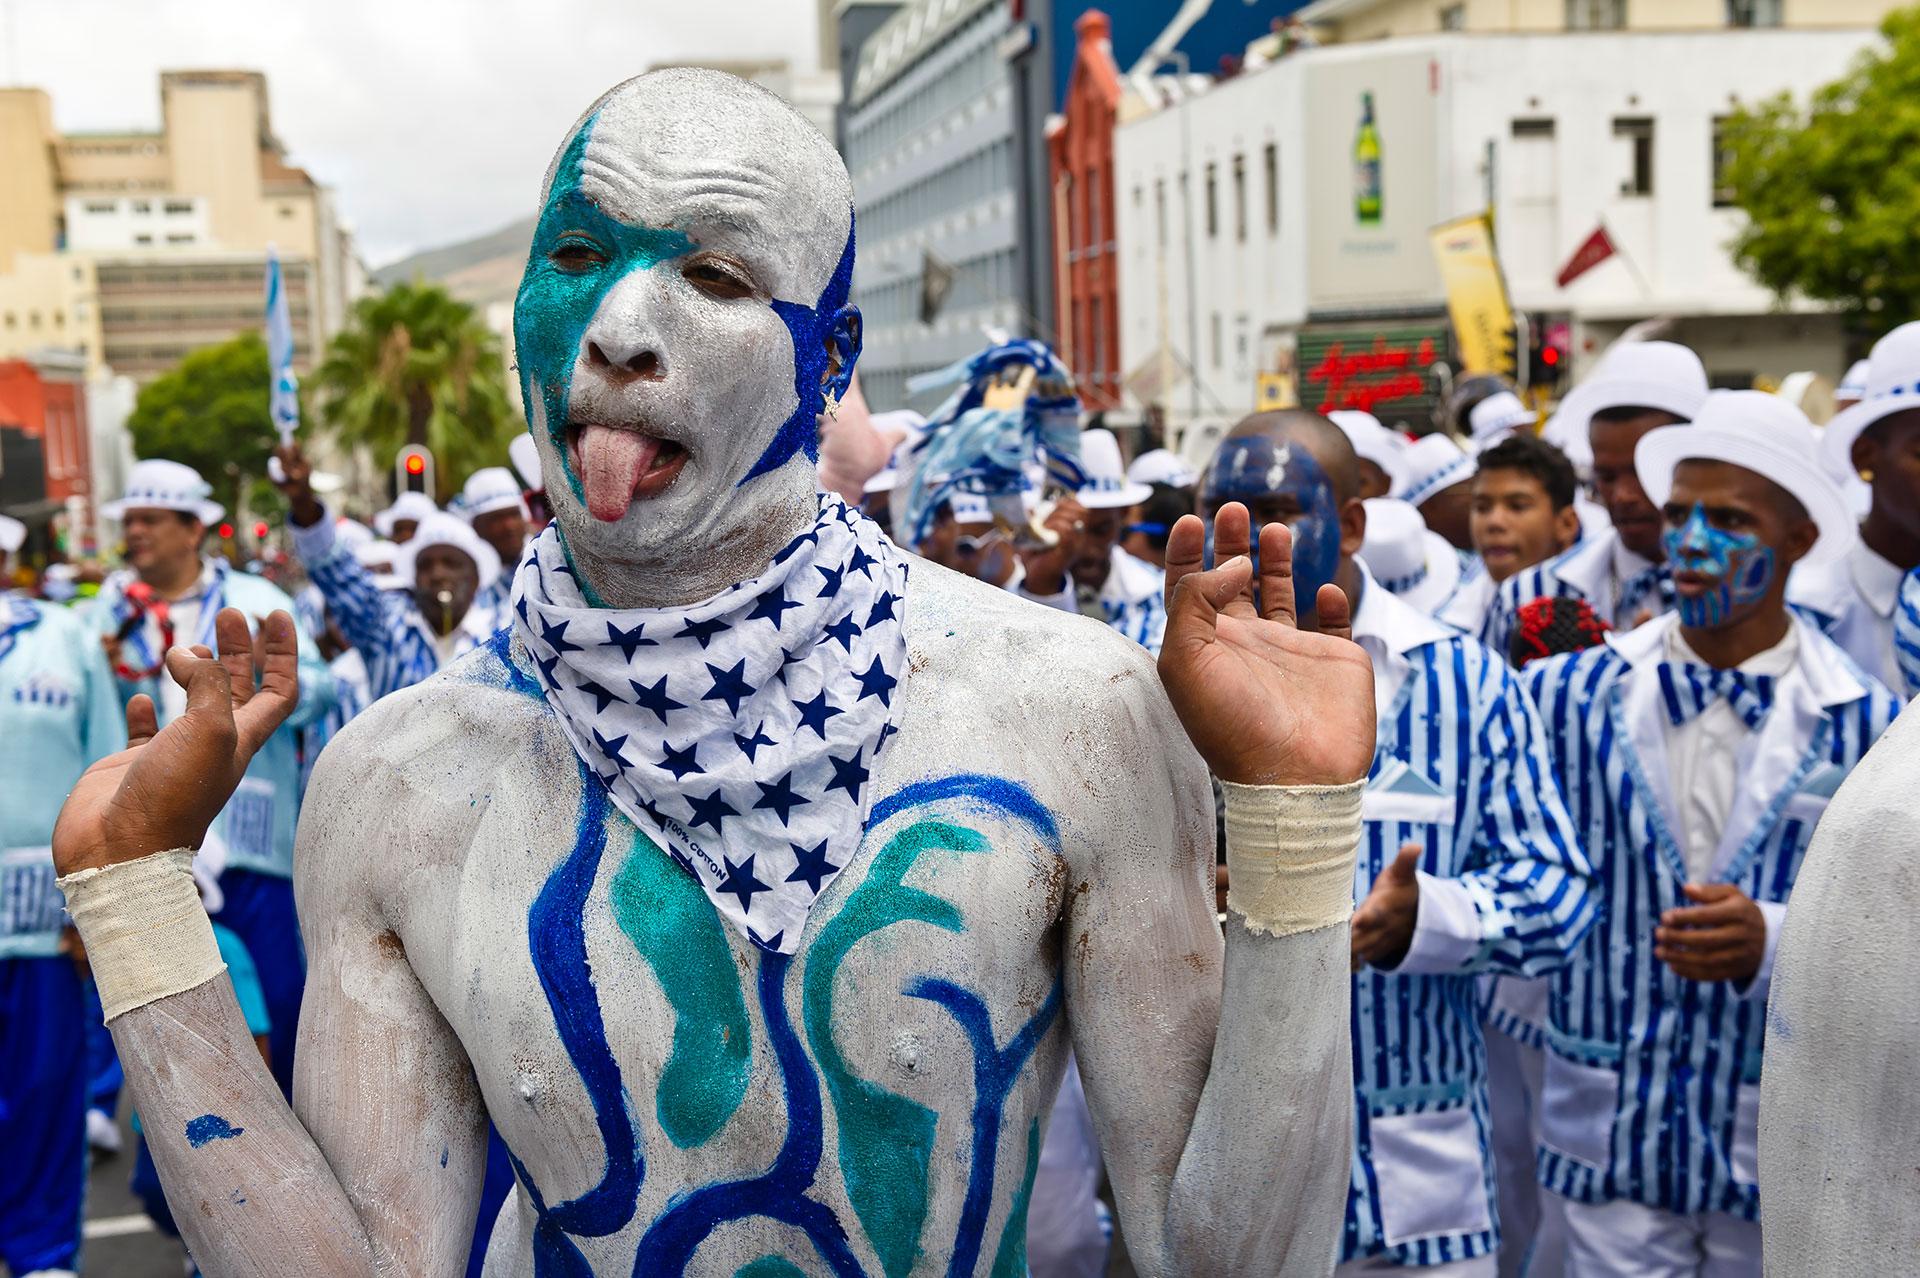 Afrika Süd Afrika Kapstadt Stadtteil Bo-Kaap Kapmalaien Malaienviertel Malay Quarter Fest Neujahrsfest Parade Coon Karneval